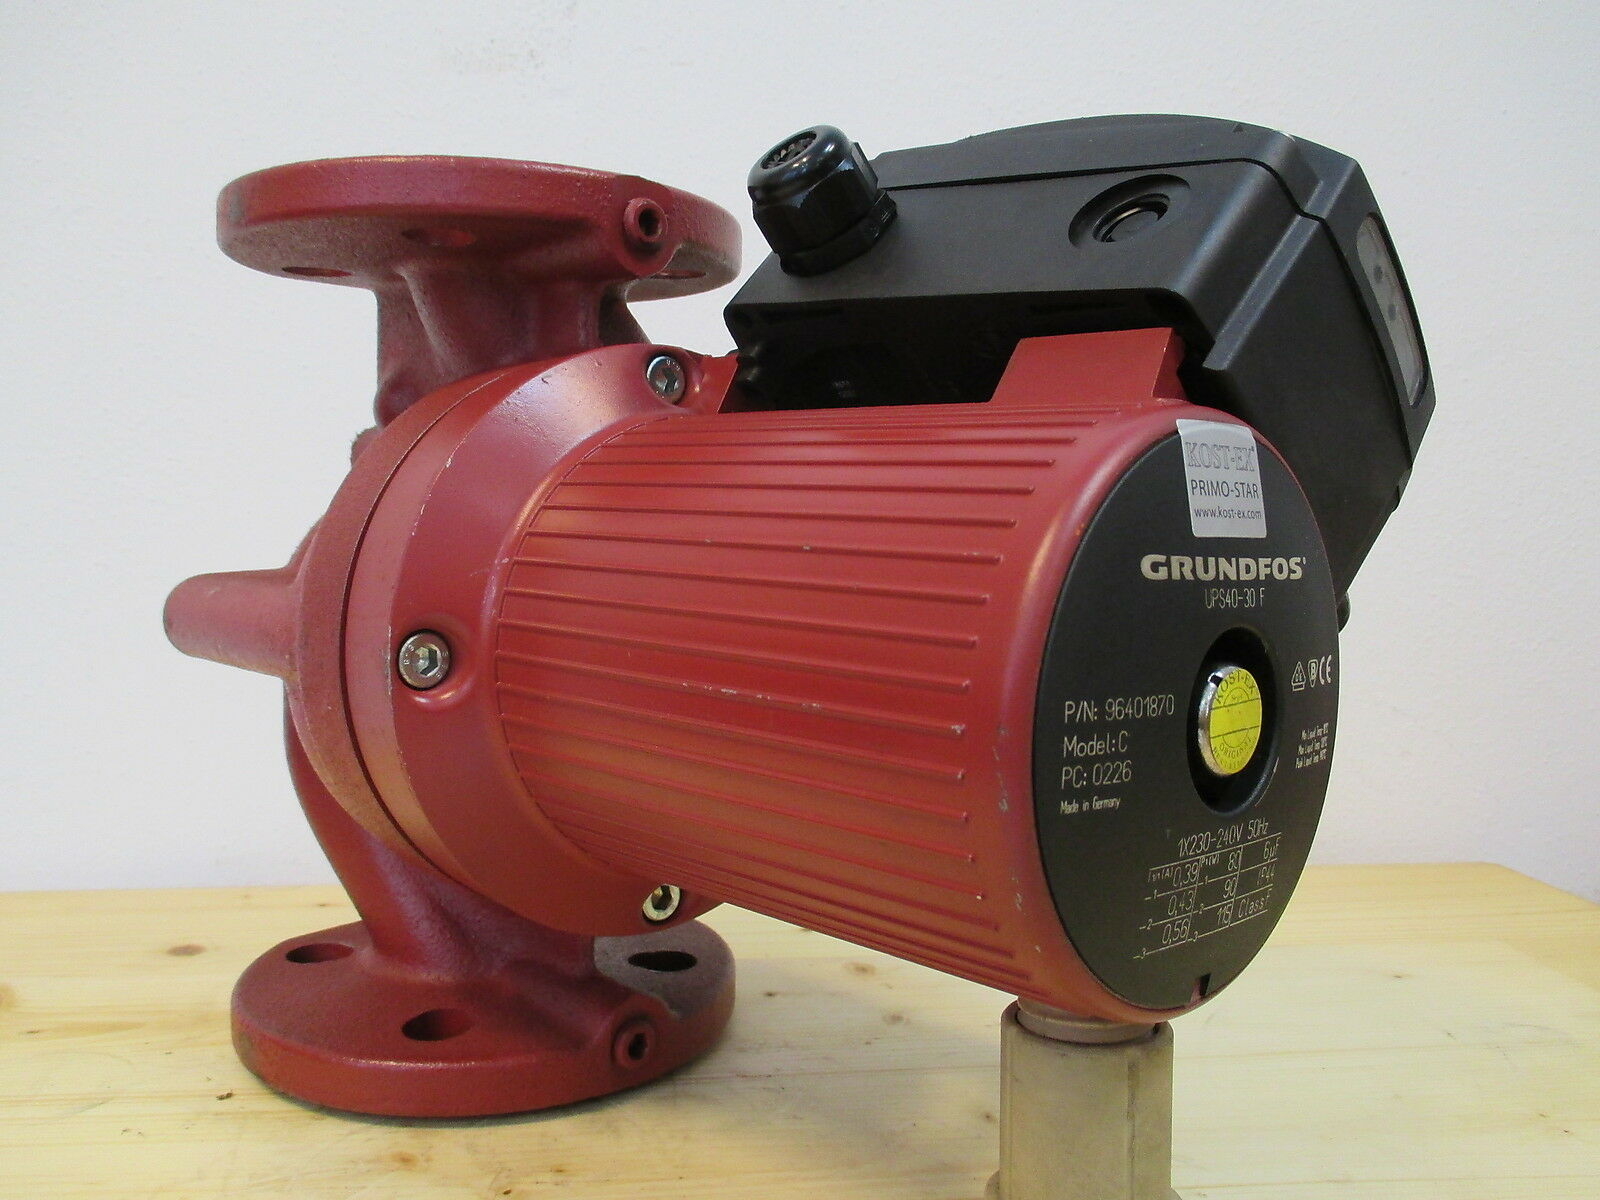 Grundfos Pumpe  UPS 40 - 30 F  Heizungspumpe Umwälzpumpe  1 x 230 V  P13 1189